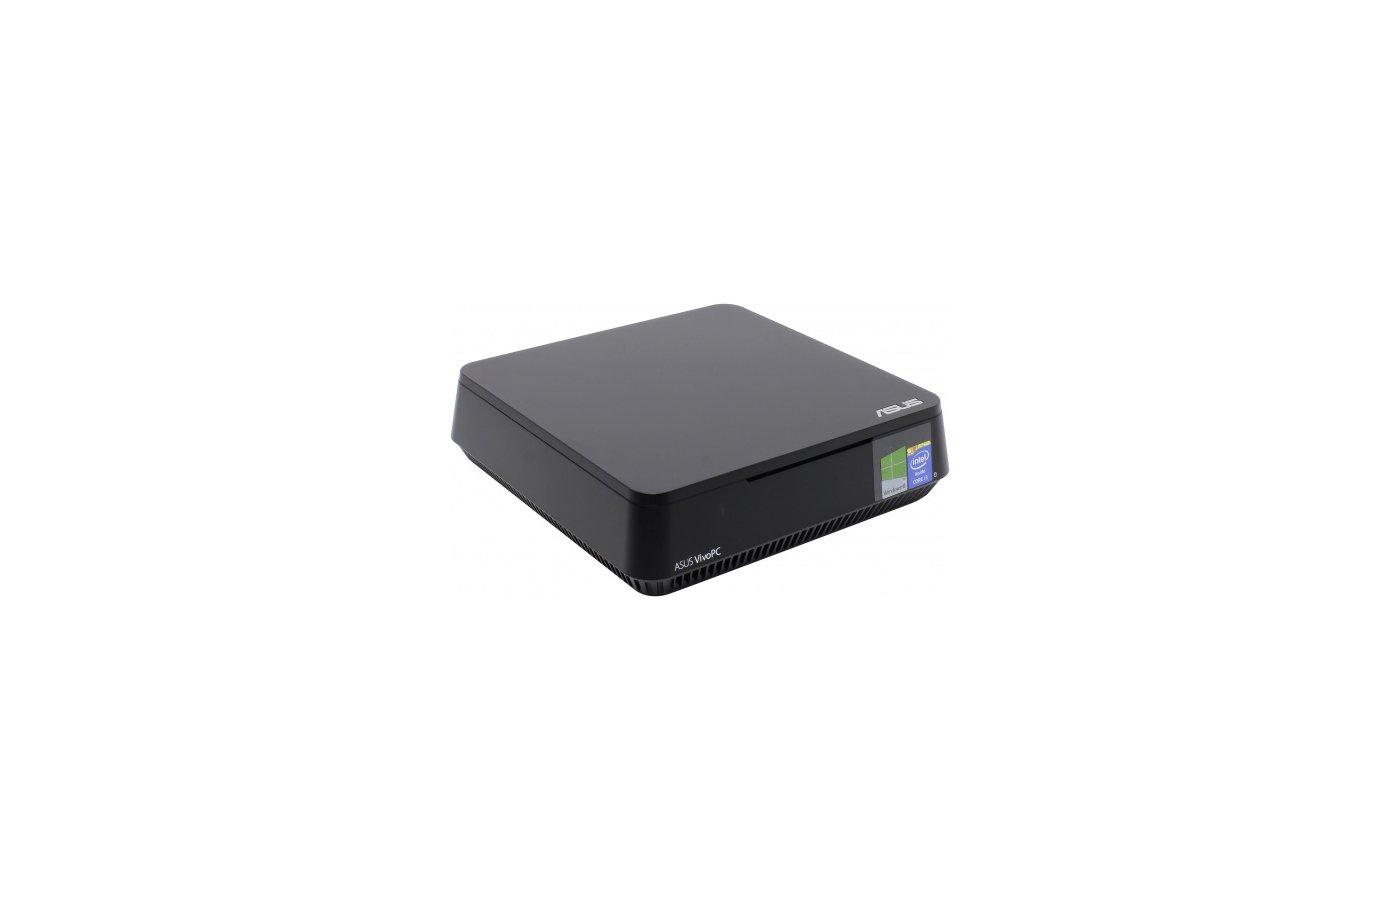 Системный блок Asus VivoPC VC60-B267Z slim /90MS0021-M02670/